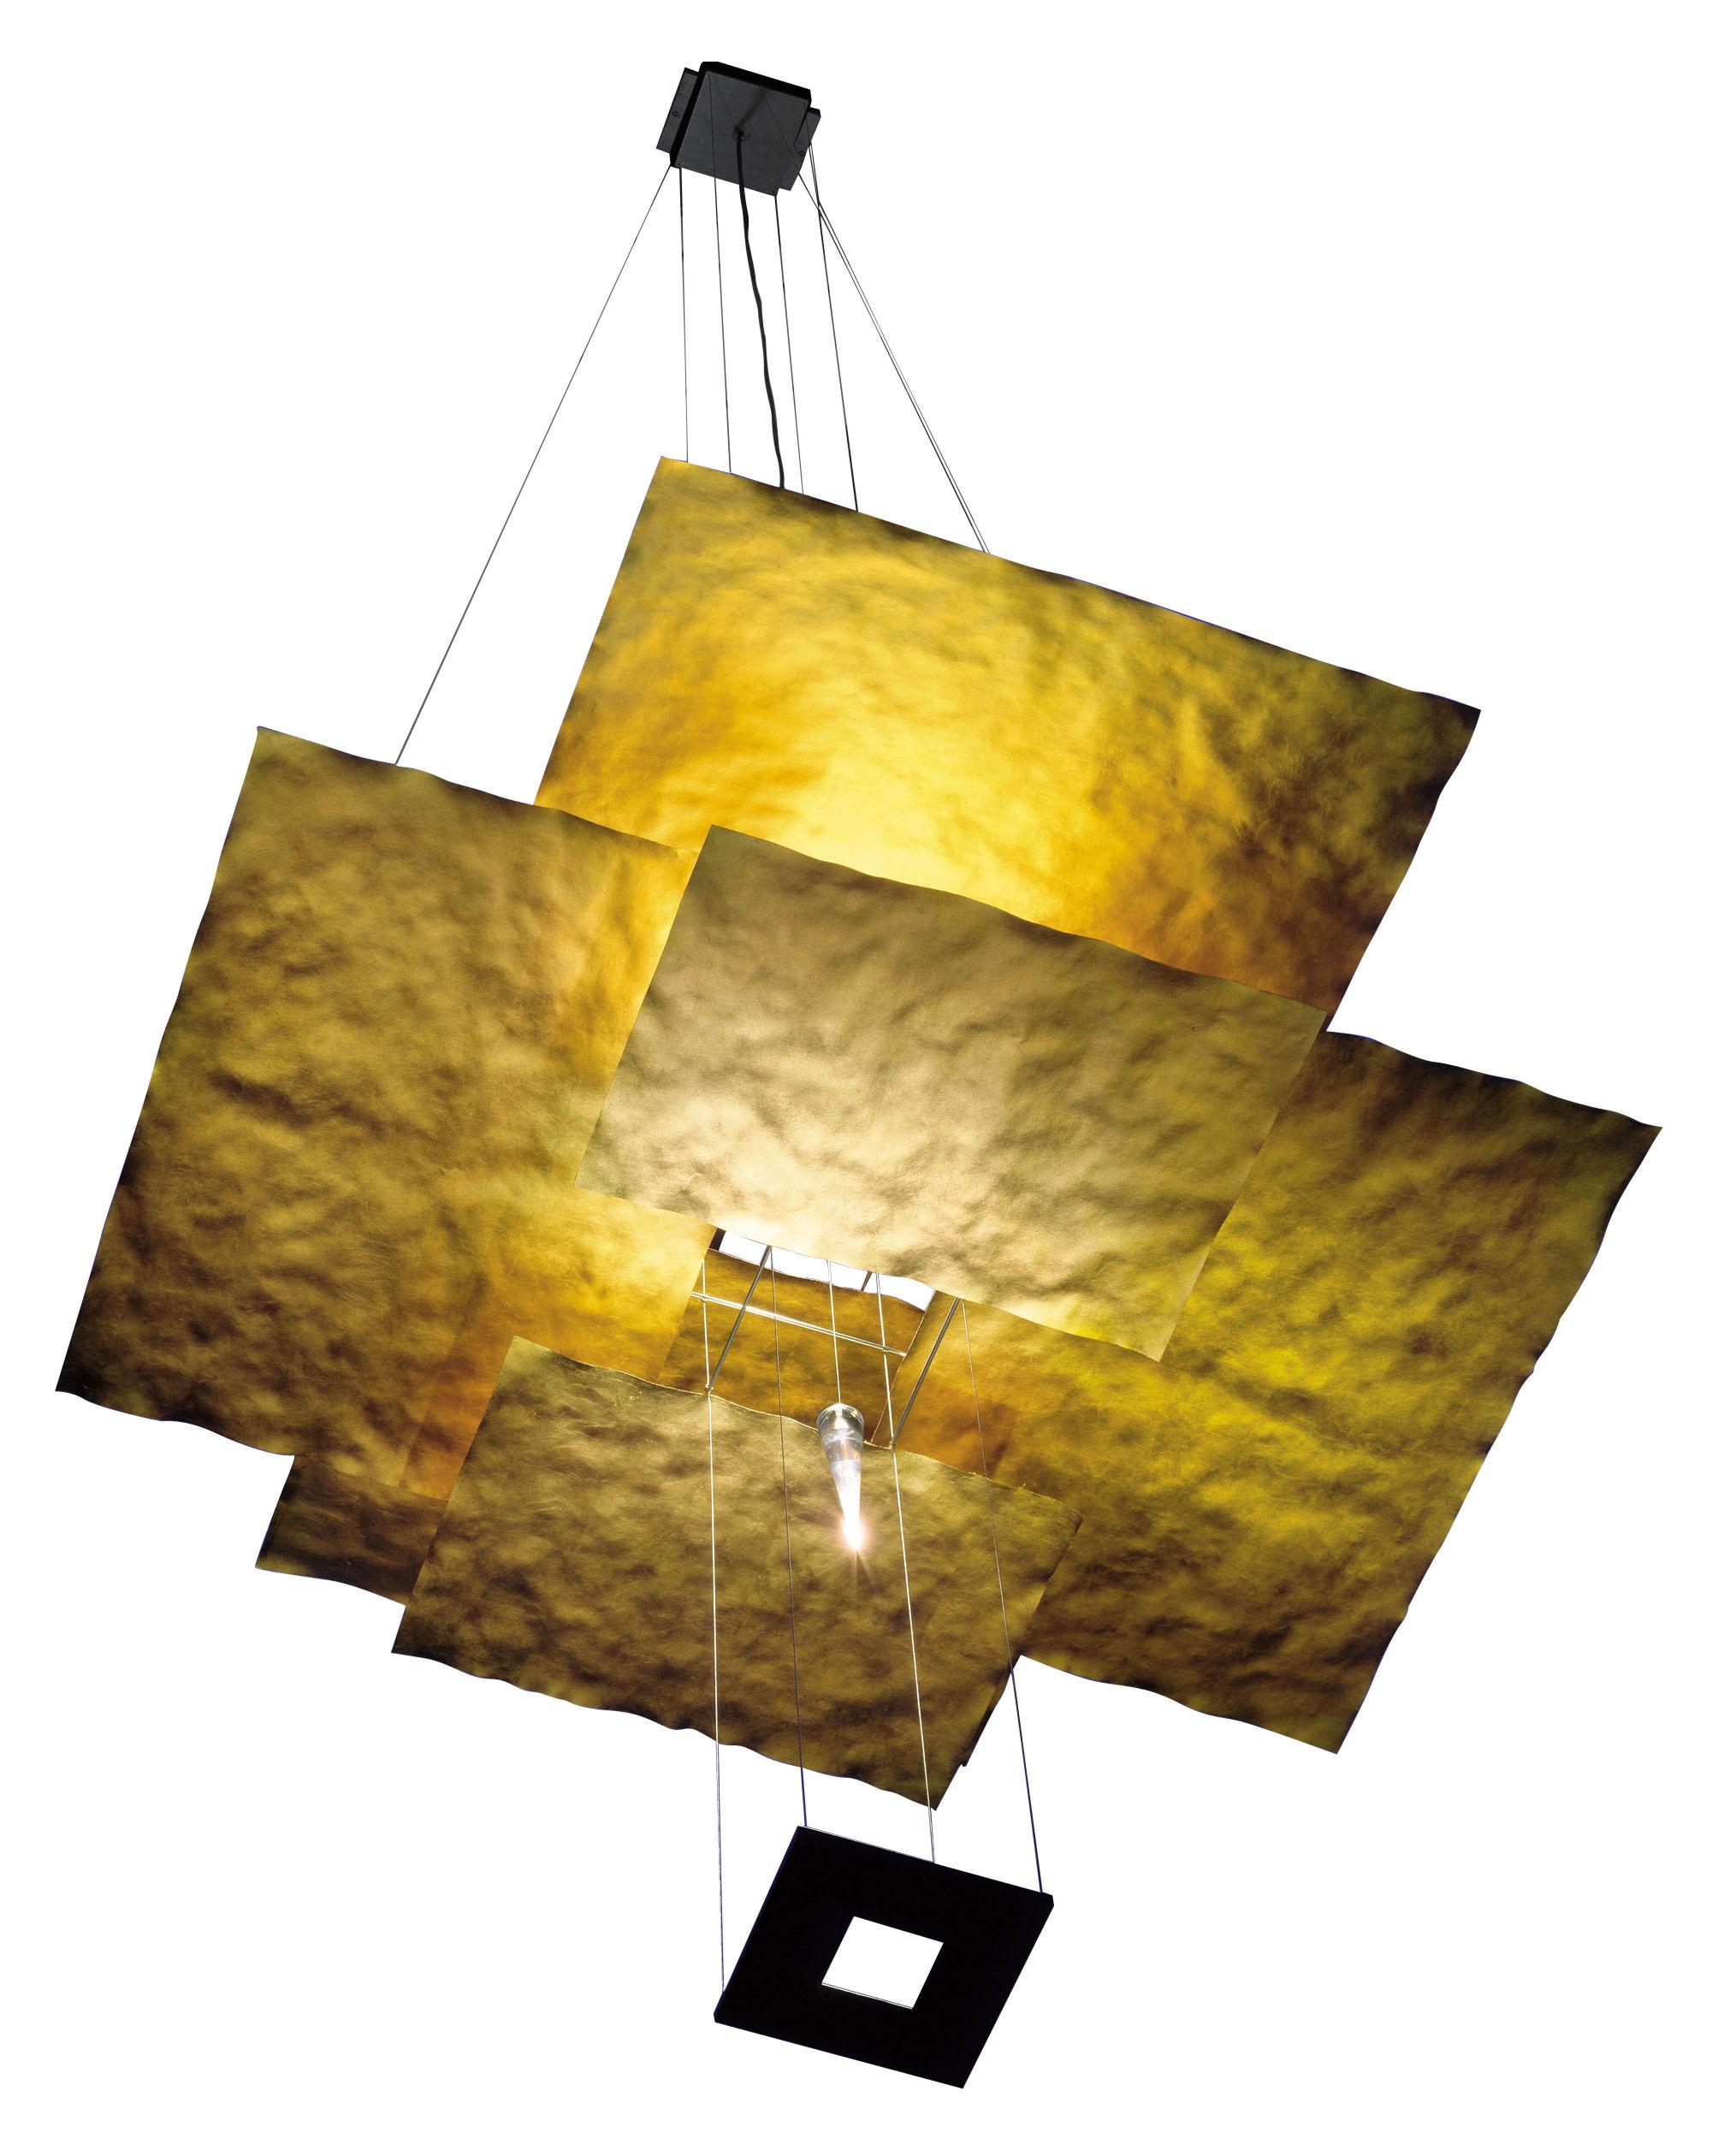 Luminaire - Suspensions - Suspension Oh Mei Ma - Or - Ingo Maurer - Or - Acier, Feuille d'or, Papier